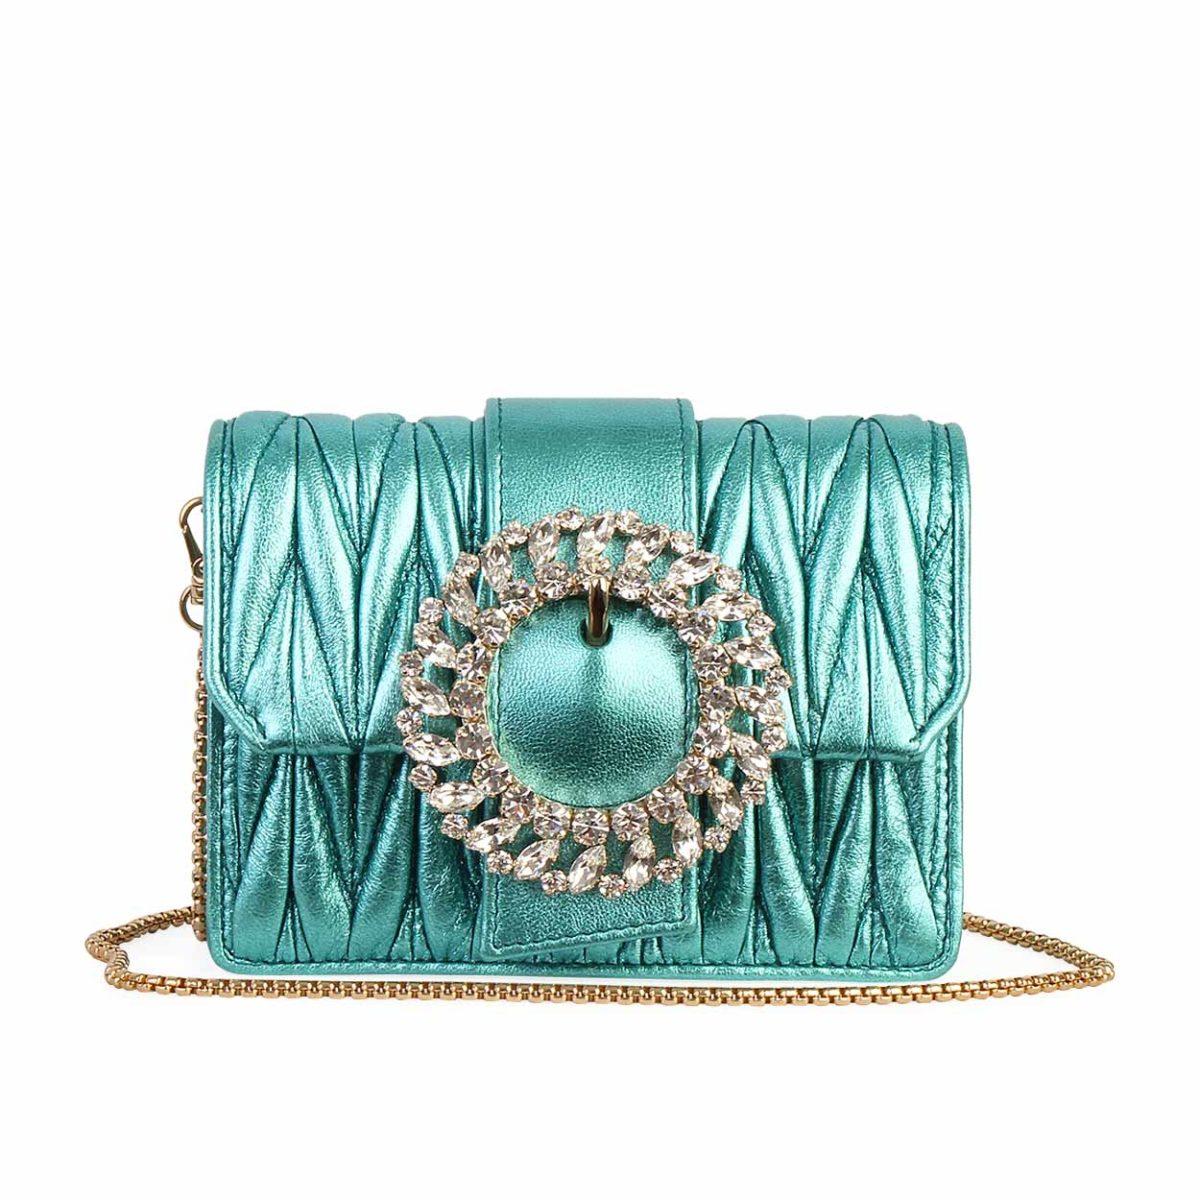 new style a9f7a f3f0d MIU MIU Matelasse Crystal Buckle Crossbody Bag Turquoise